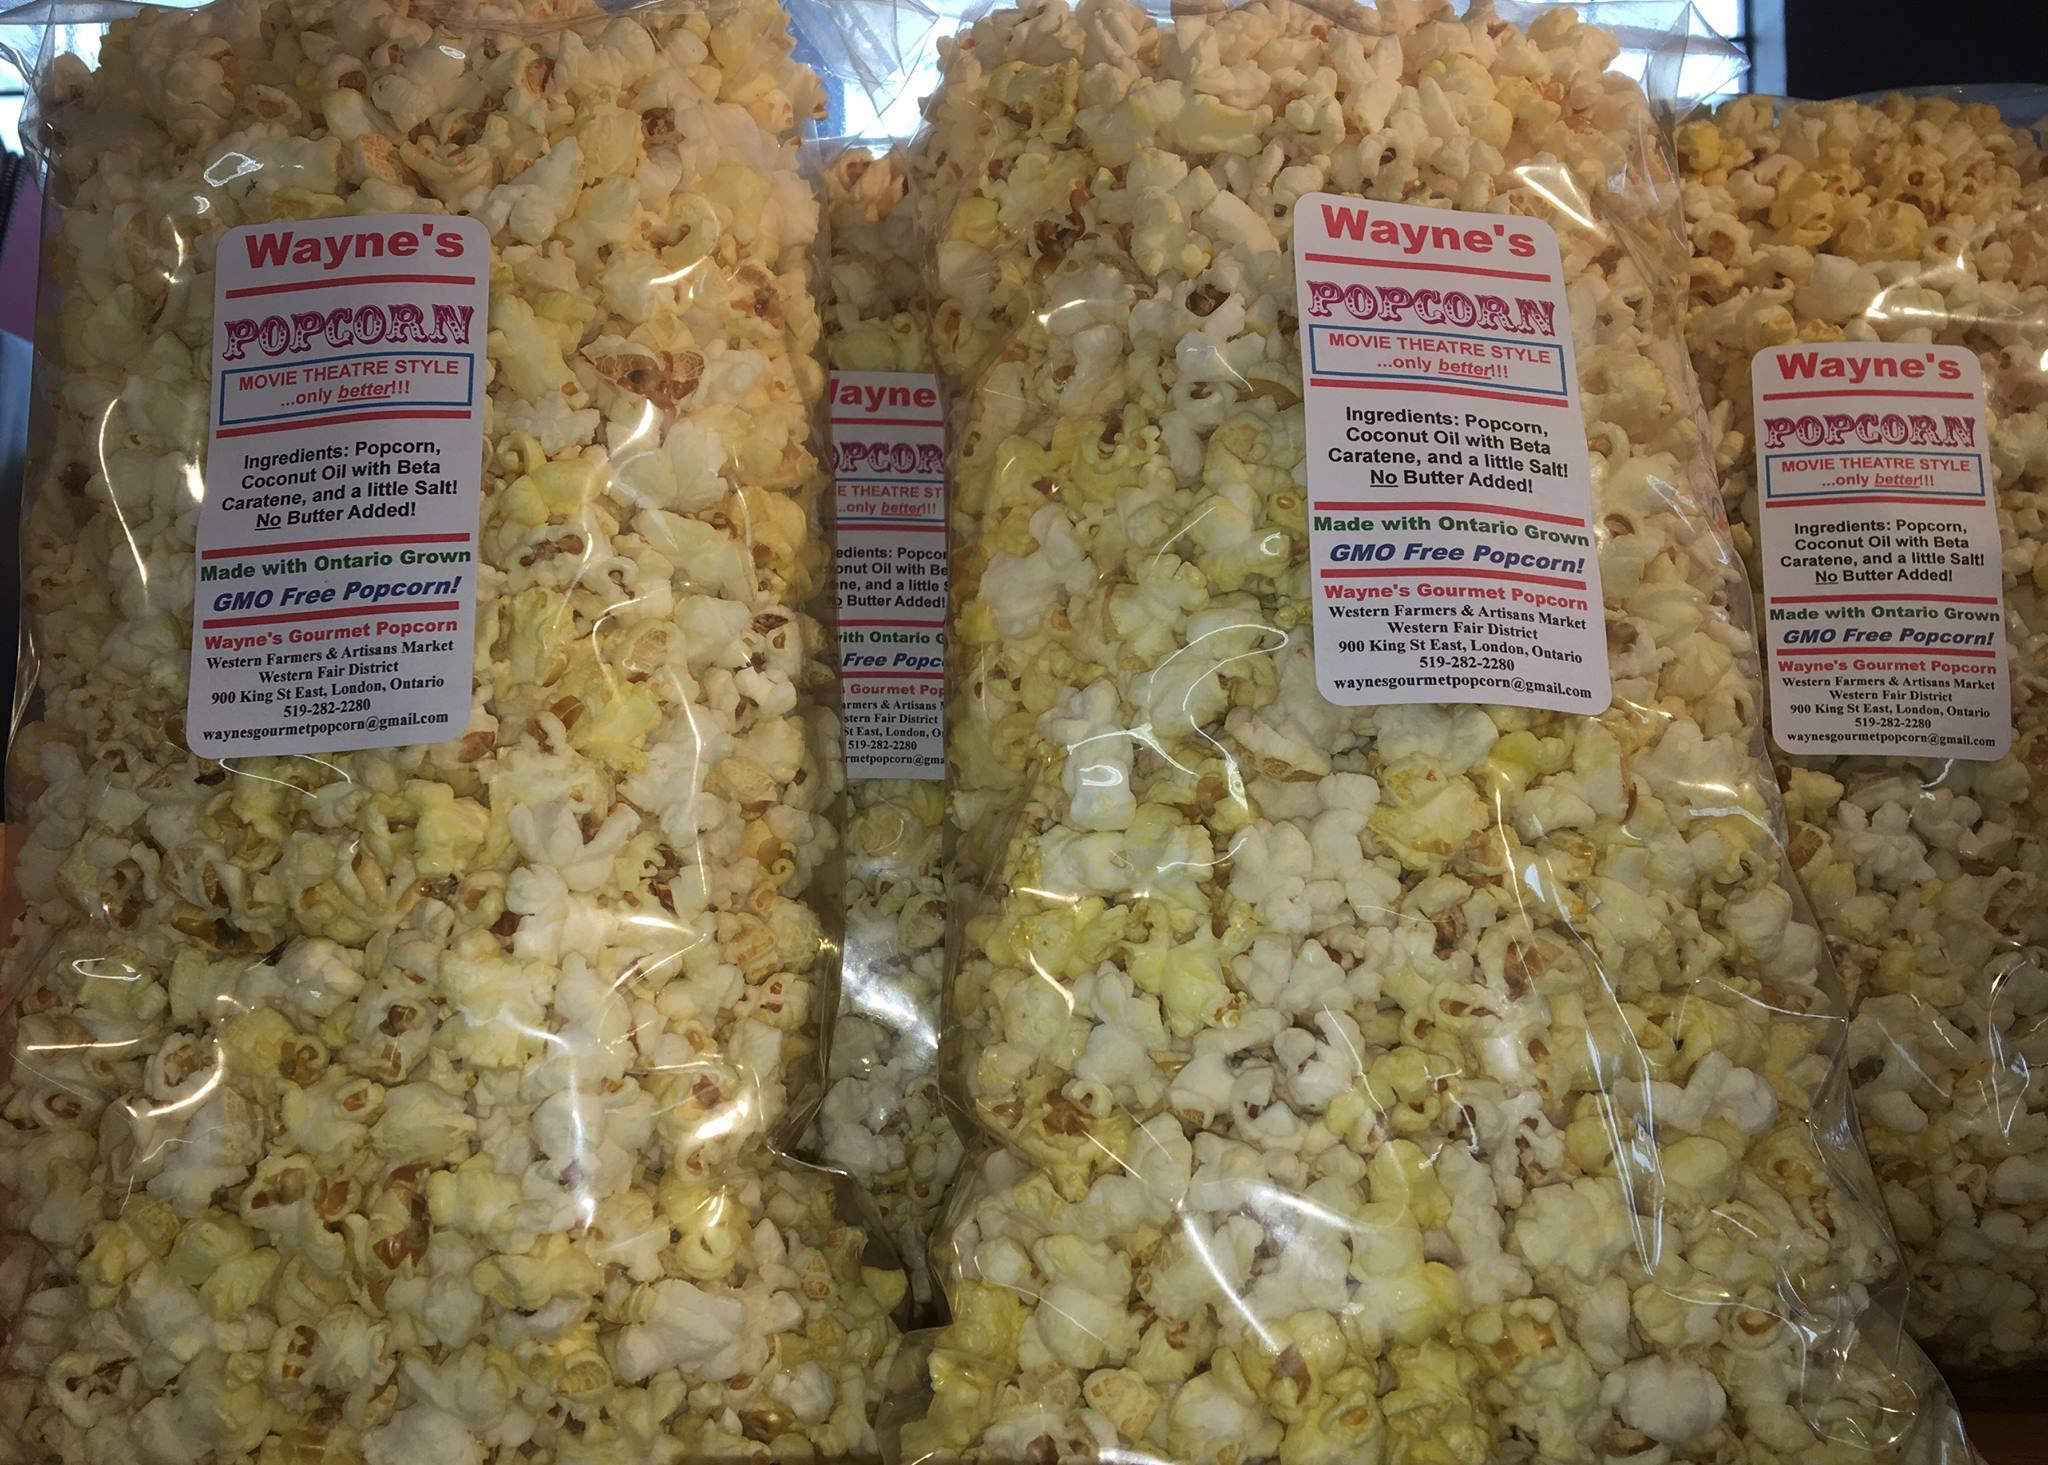 Wayne's Gourmet Popcorn Logo